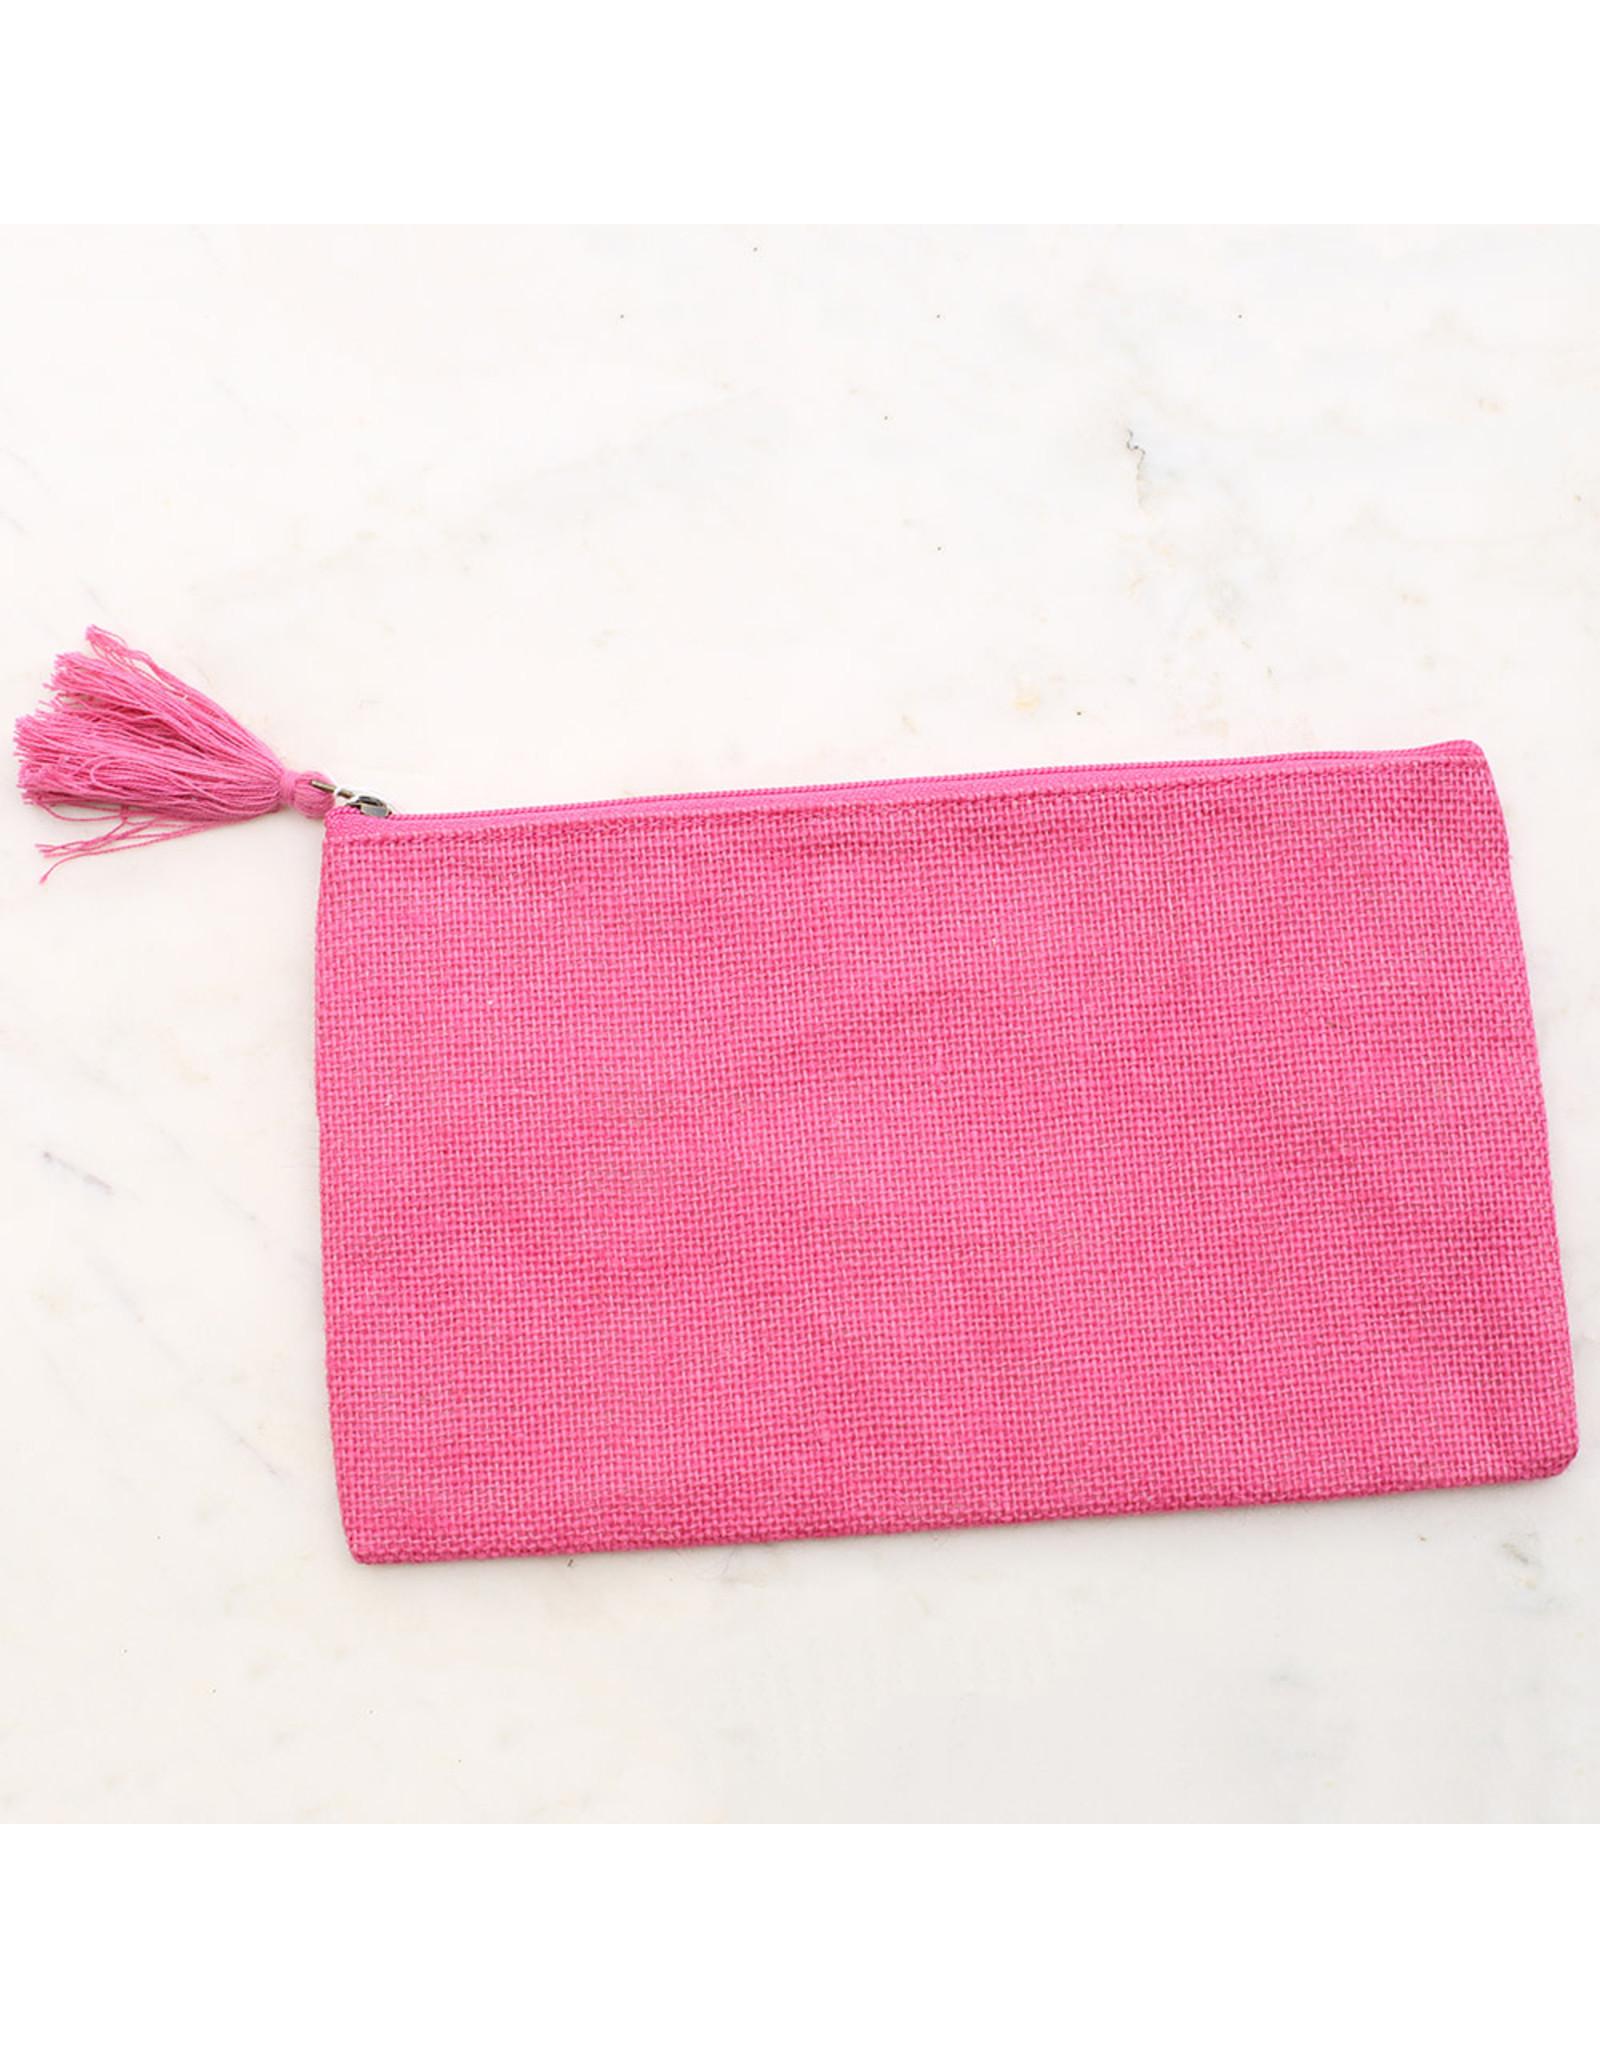 GET PRETTY Jute Cosmetic Bag (includes monogram)